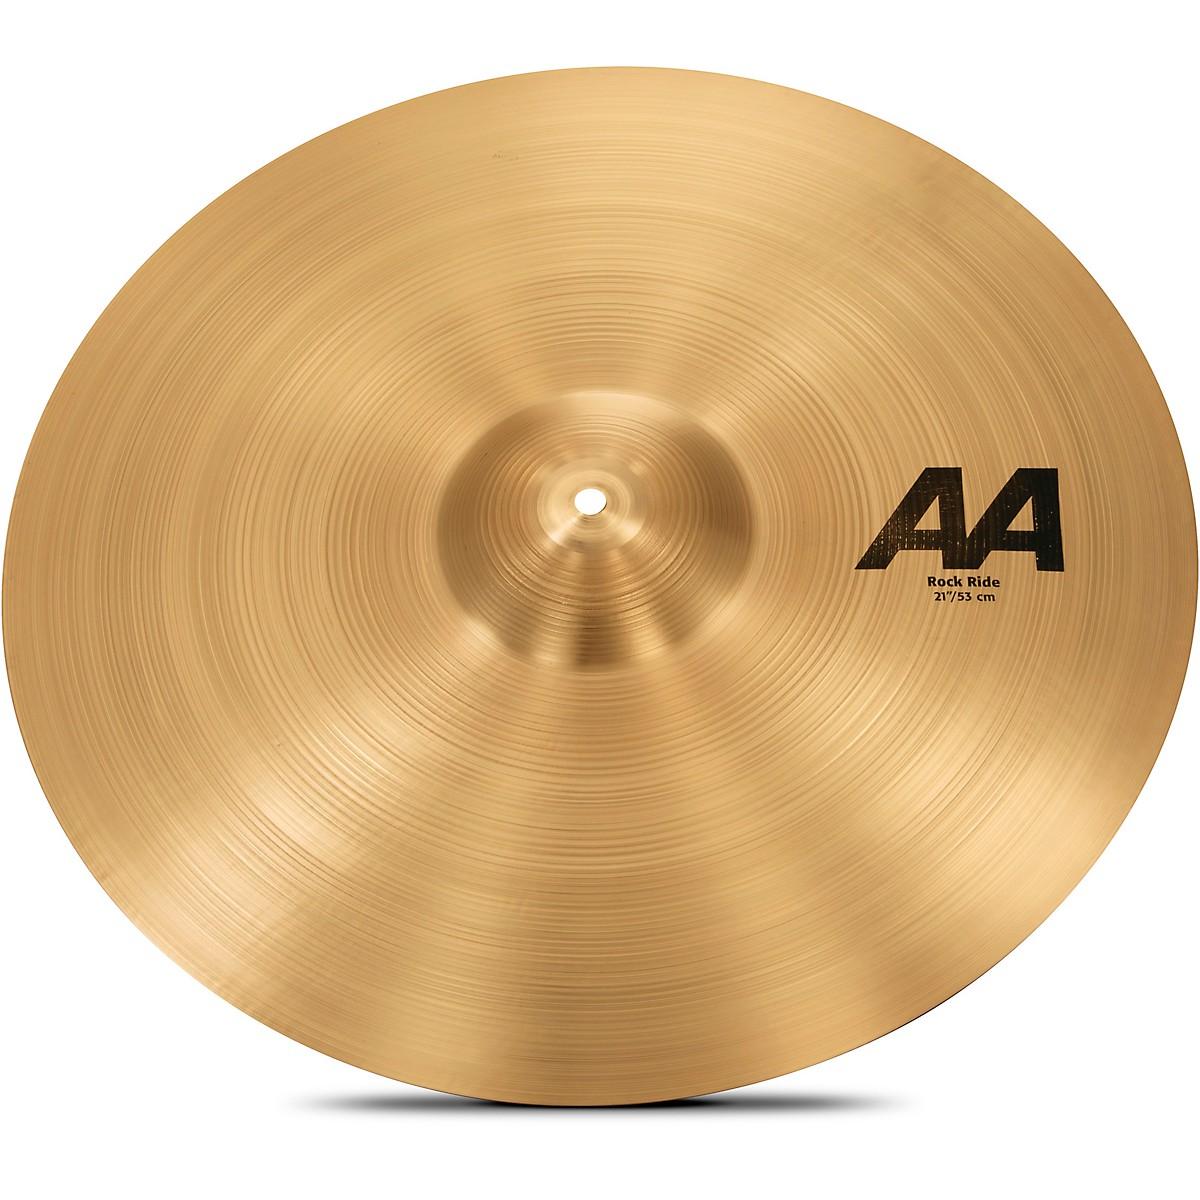 Sabian AA Rock Ride Cymbal